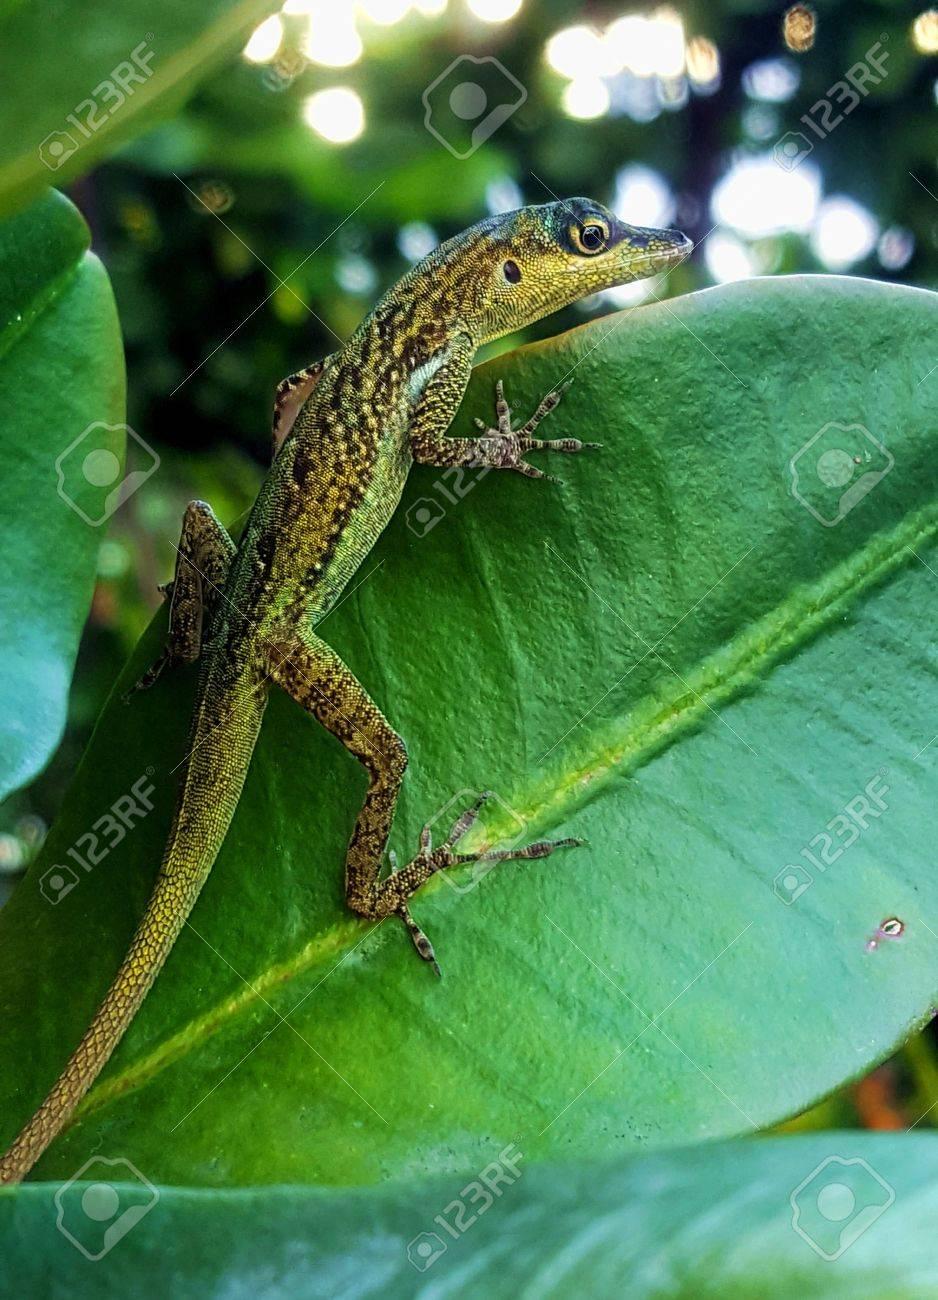 green lizard on leaf Stock Photo - 65556441